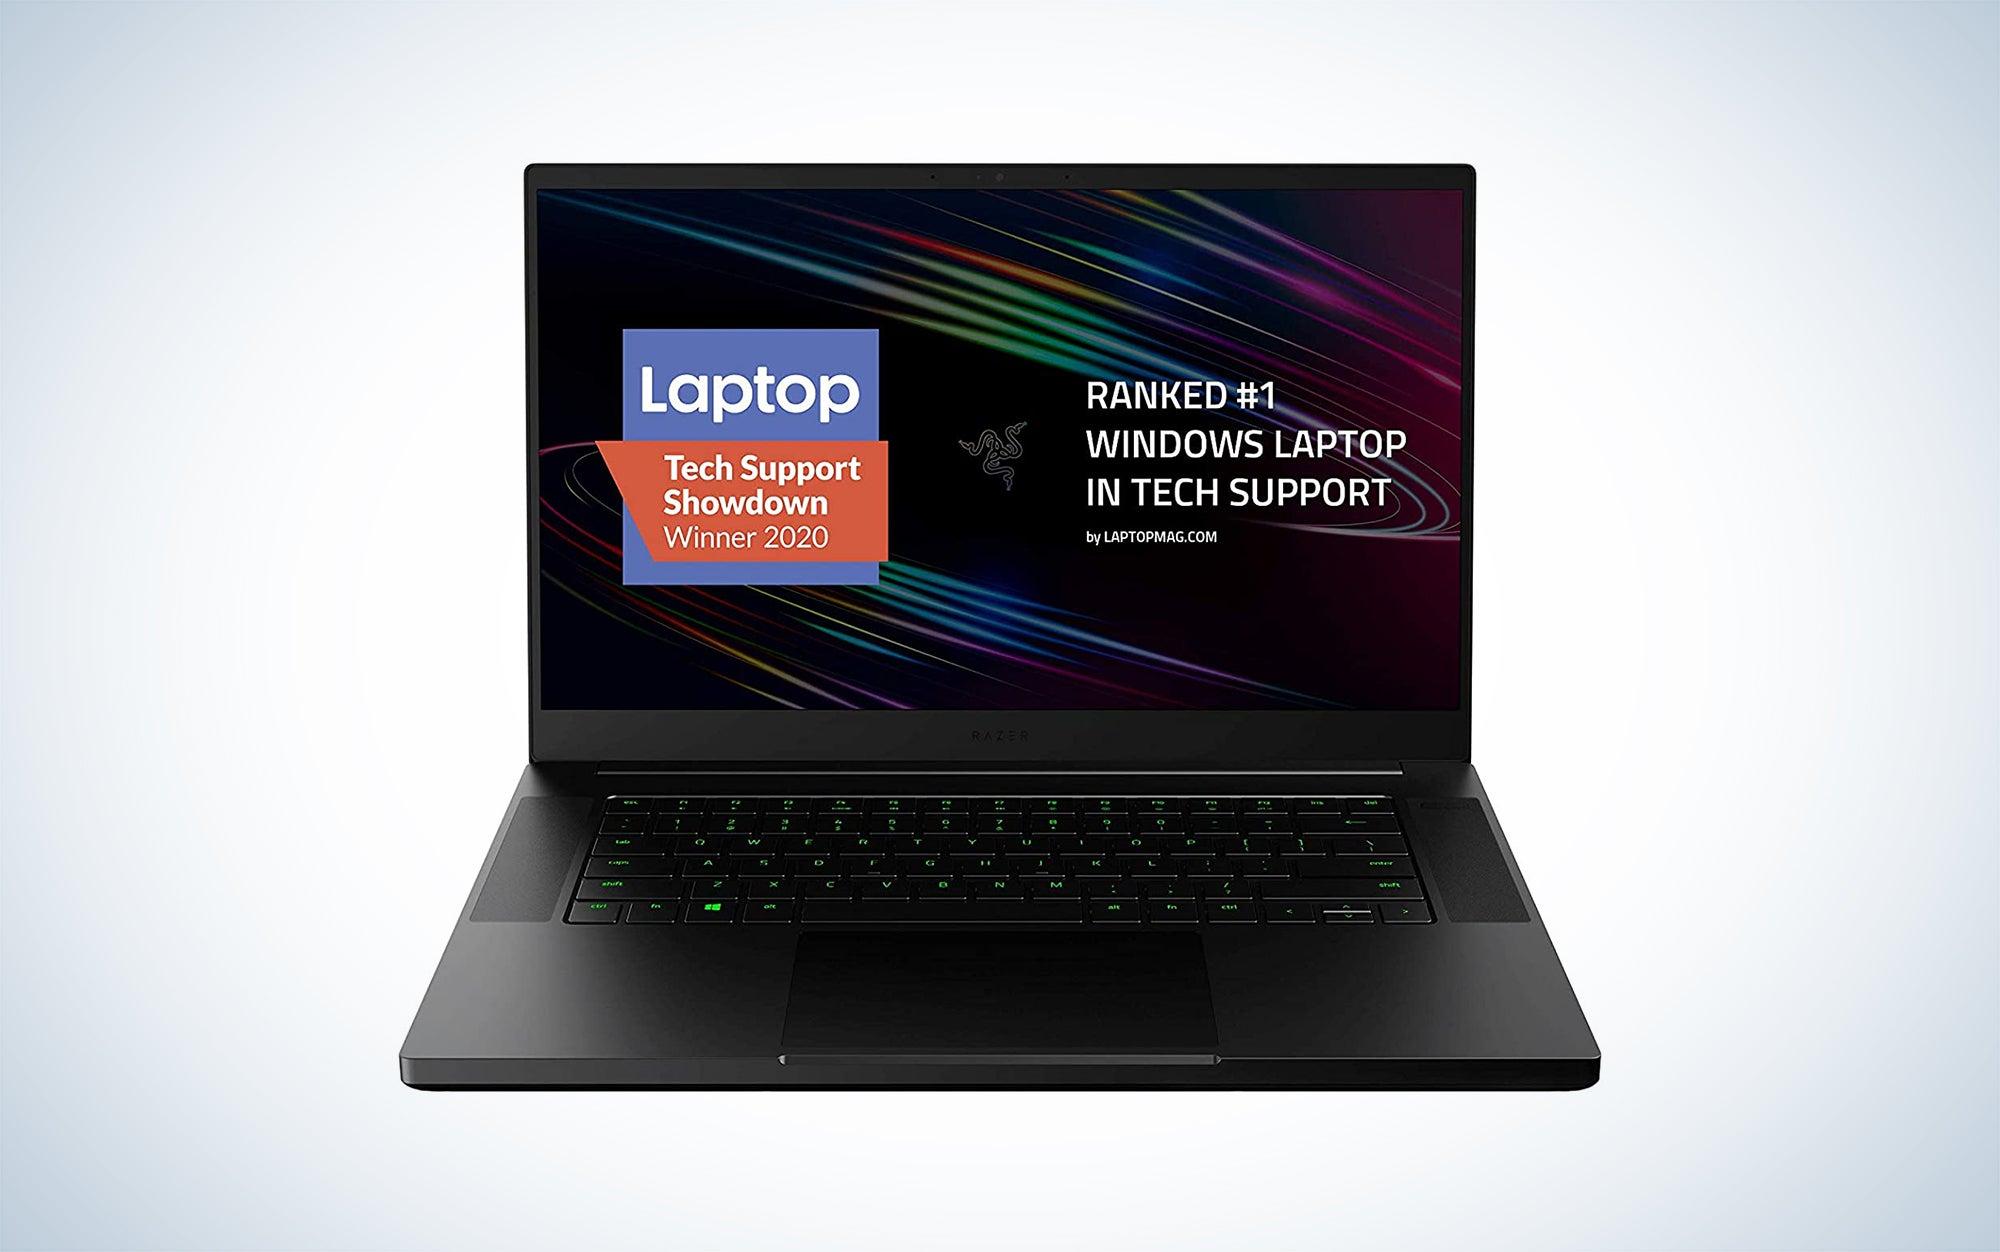 Razer Blade 15 Base Gaming Laptop 2020 is one of the best Razer gaming laptops on the market.